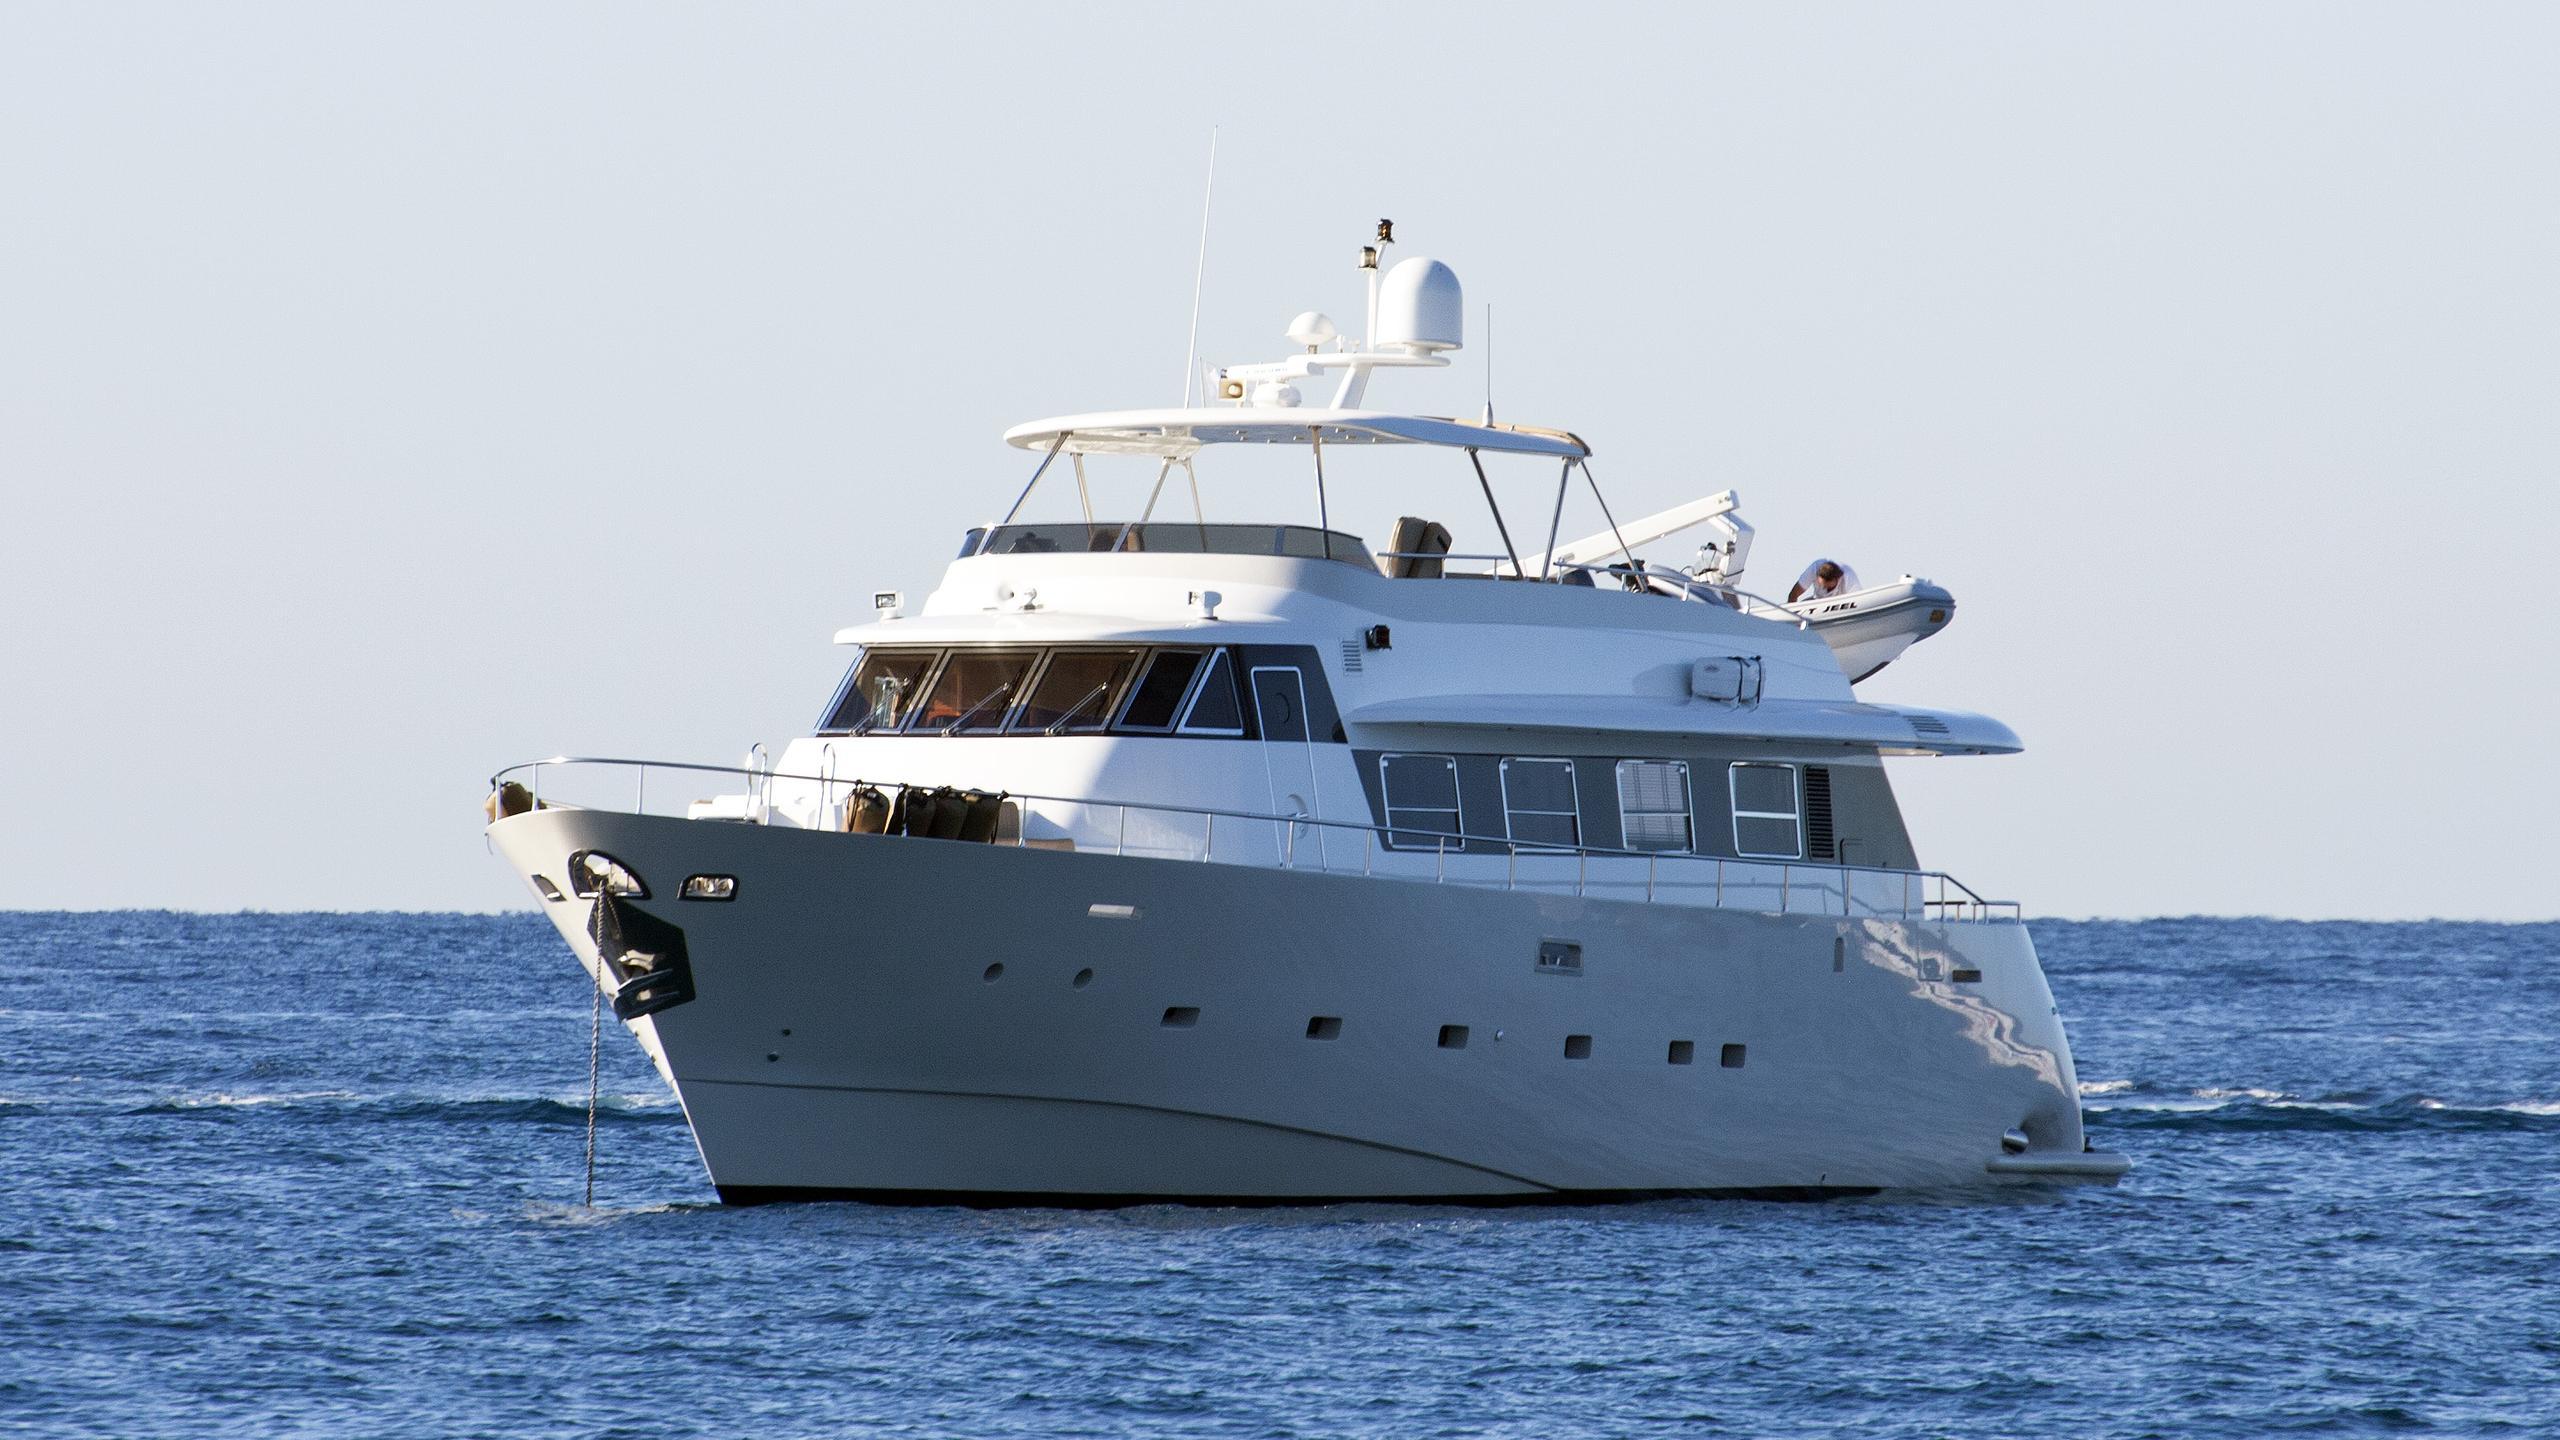 jeel-motoryacht-mondomarine-2003-24m-half-profile